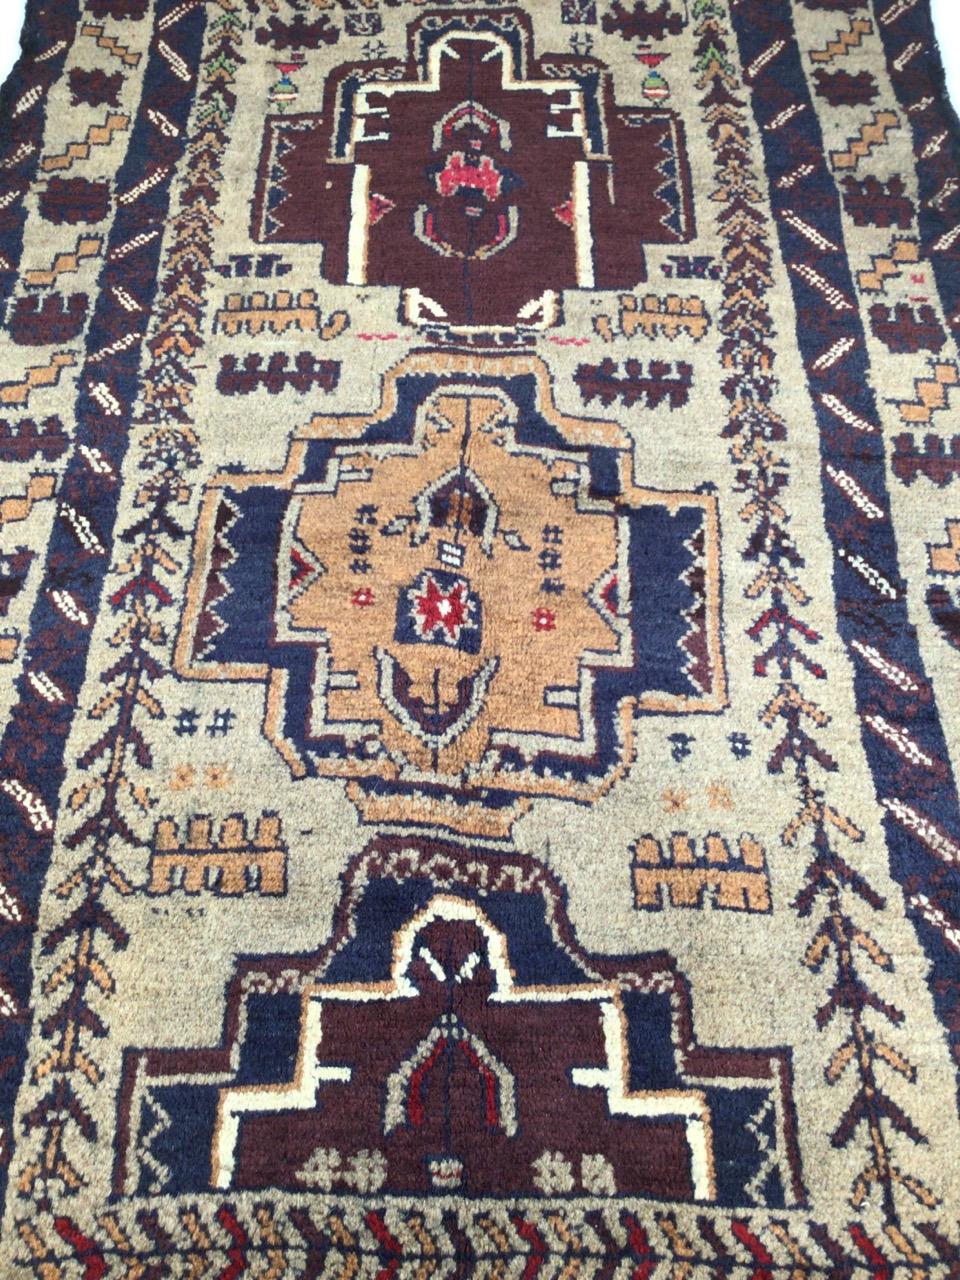 A old Baluchi rug. W:83cm x H:138cm - Image 3 of 3